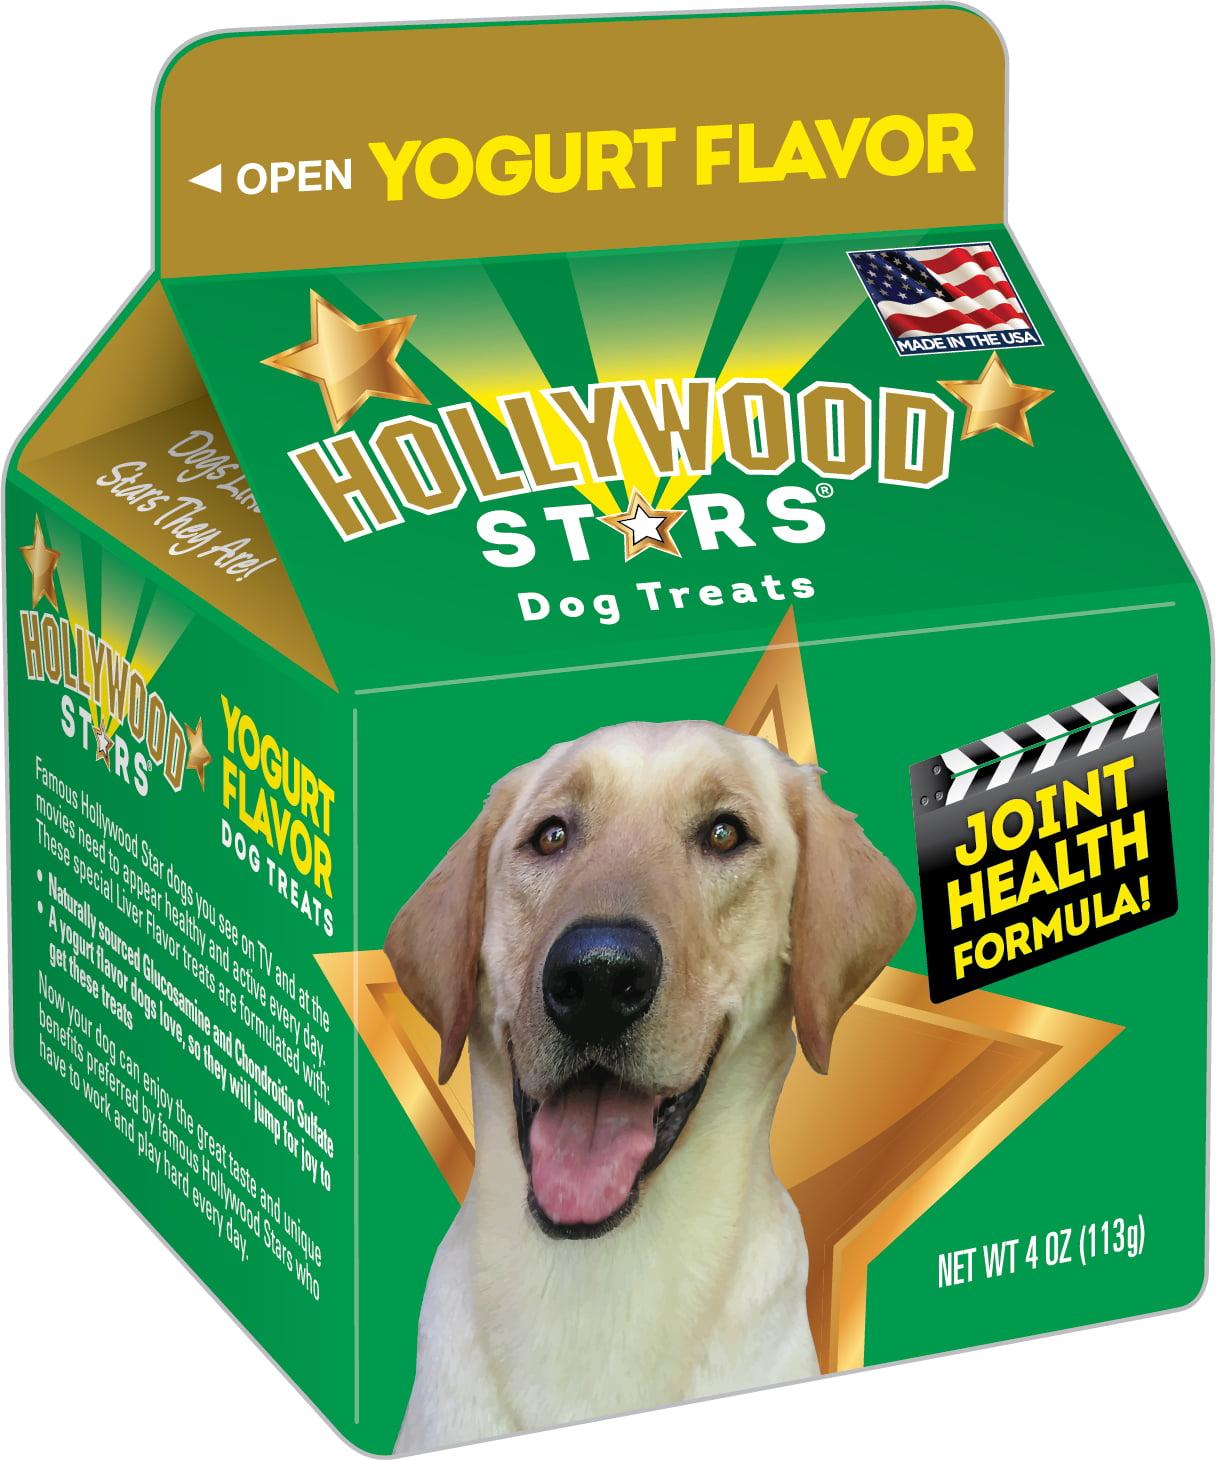 Hollywood Stars Dog Treats Yogurt Flavor by Bil-Jac Foods